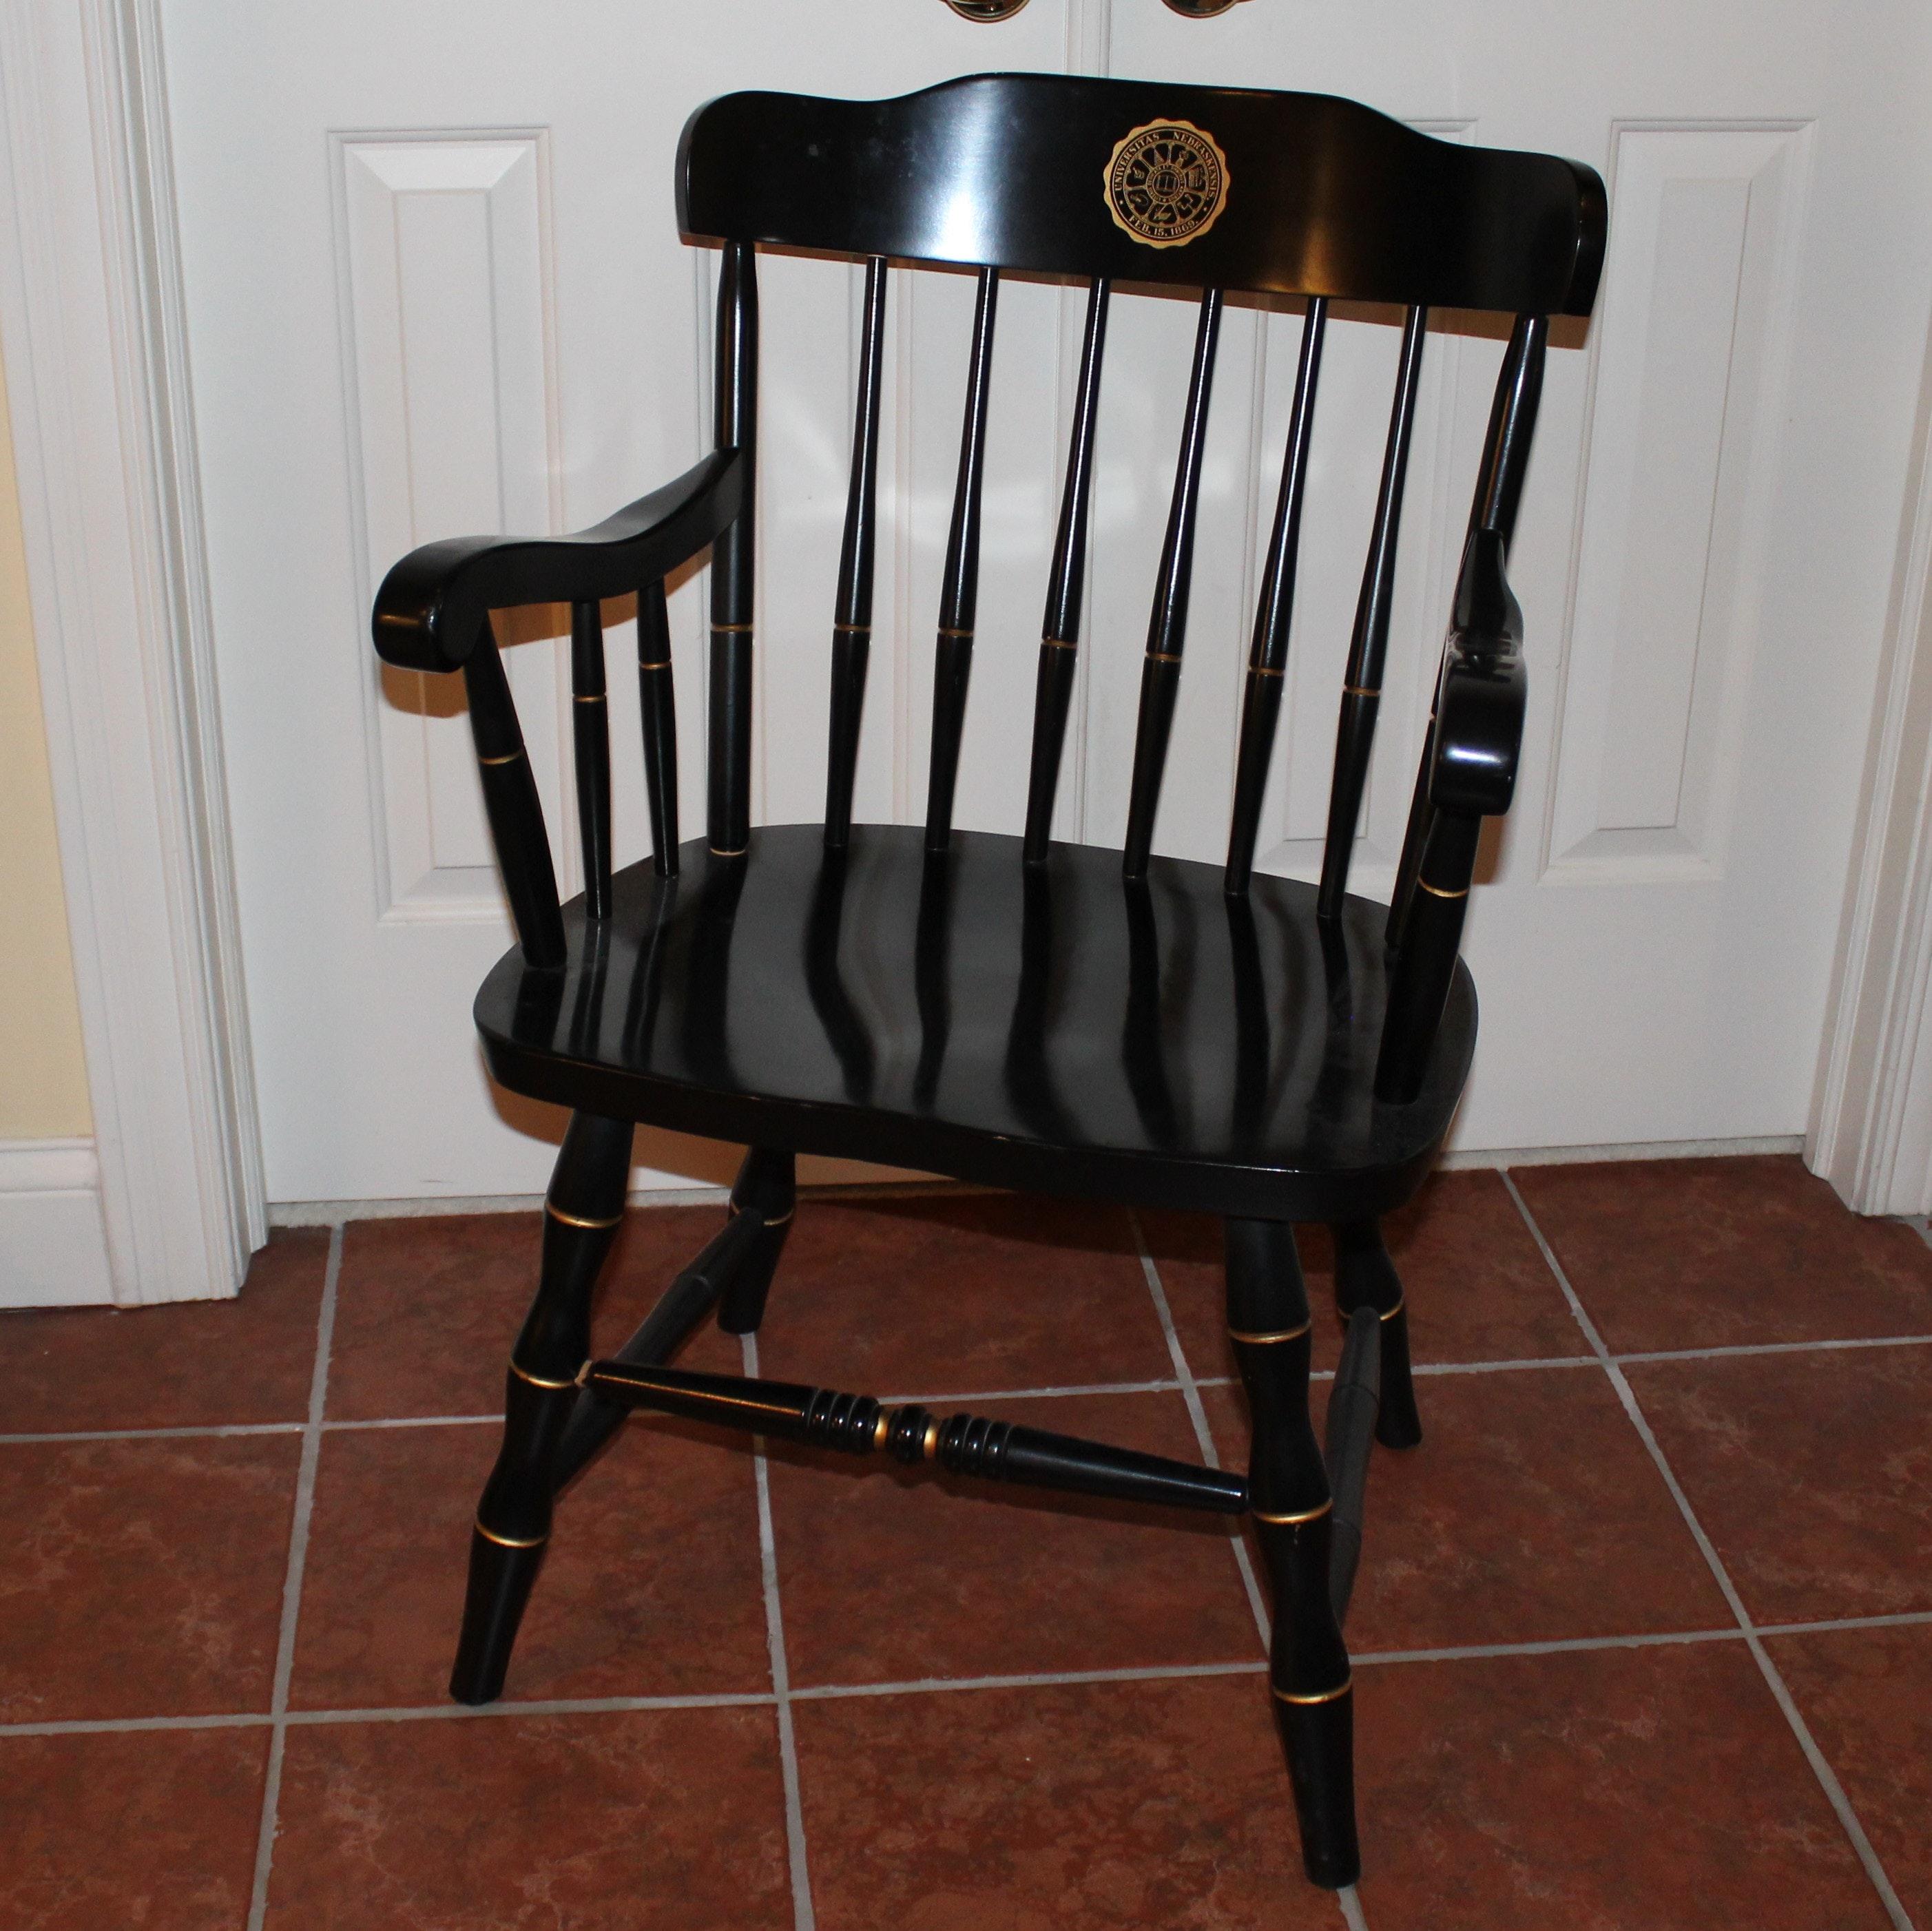 University Chair from The University of Nebraska